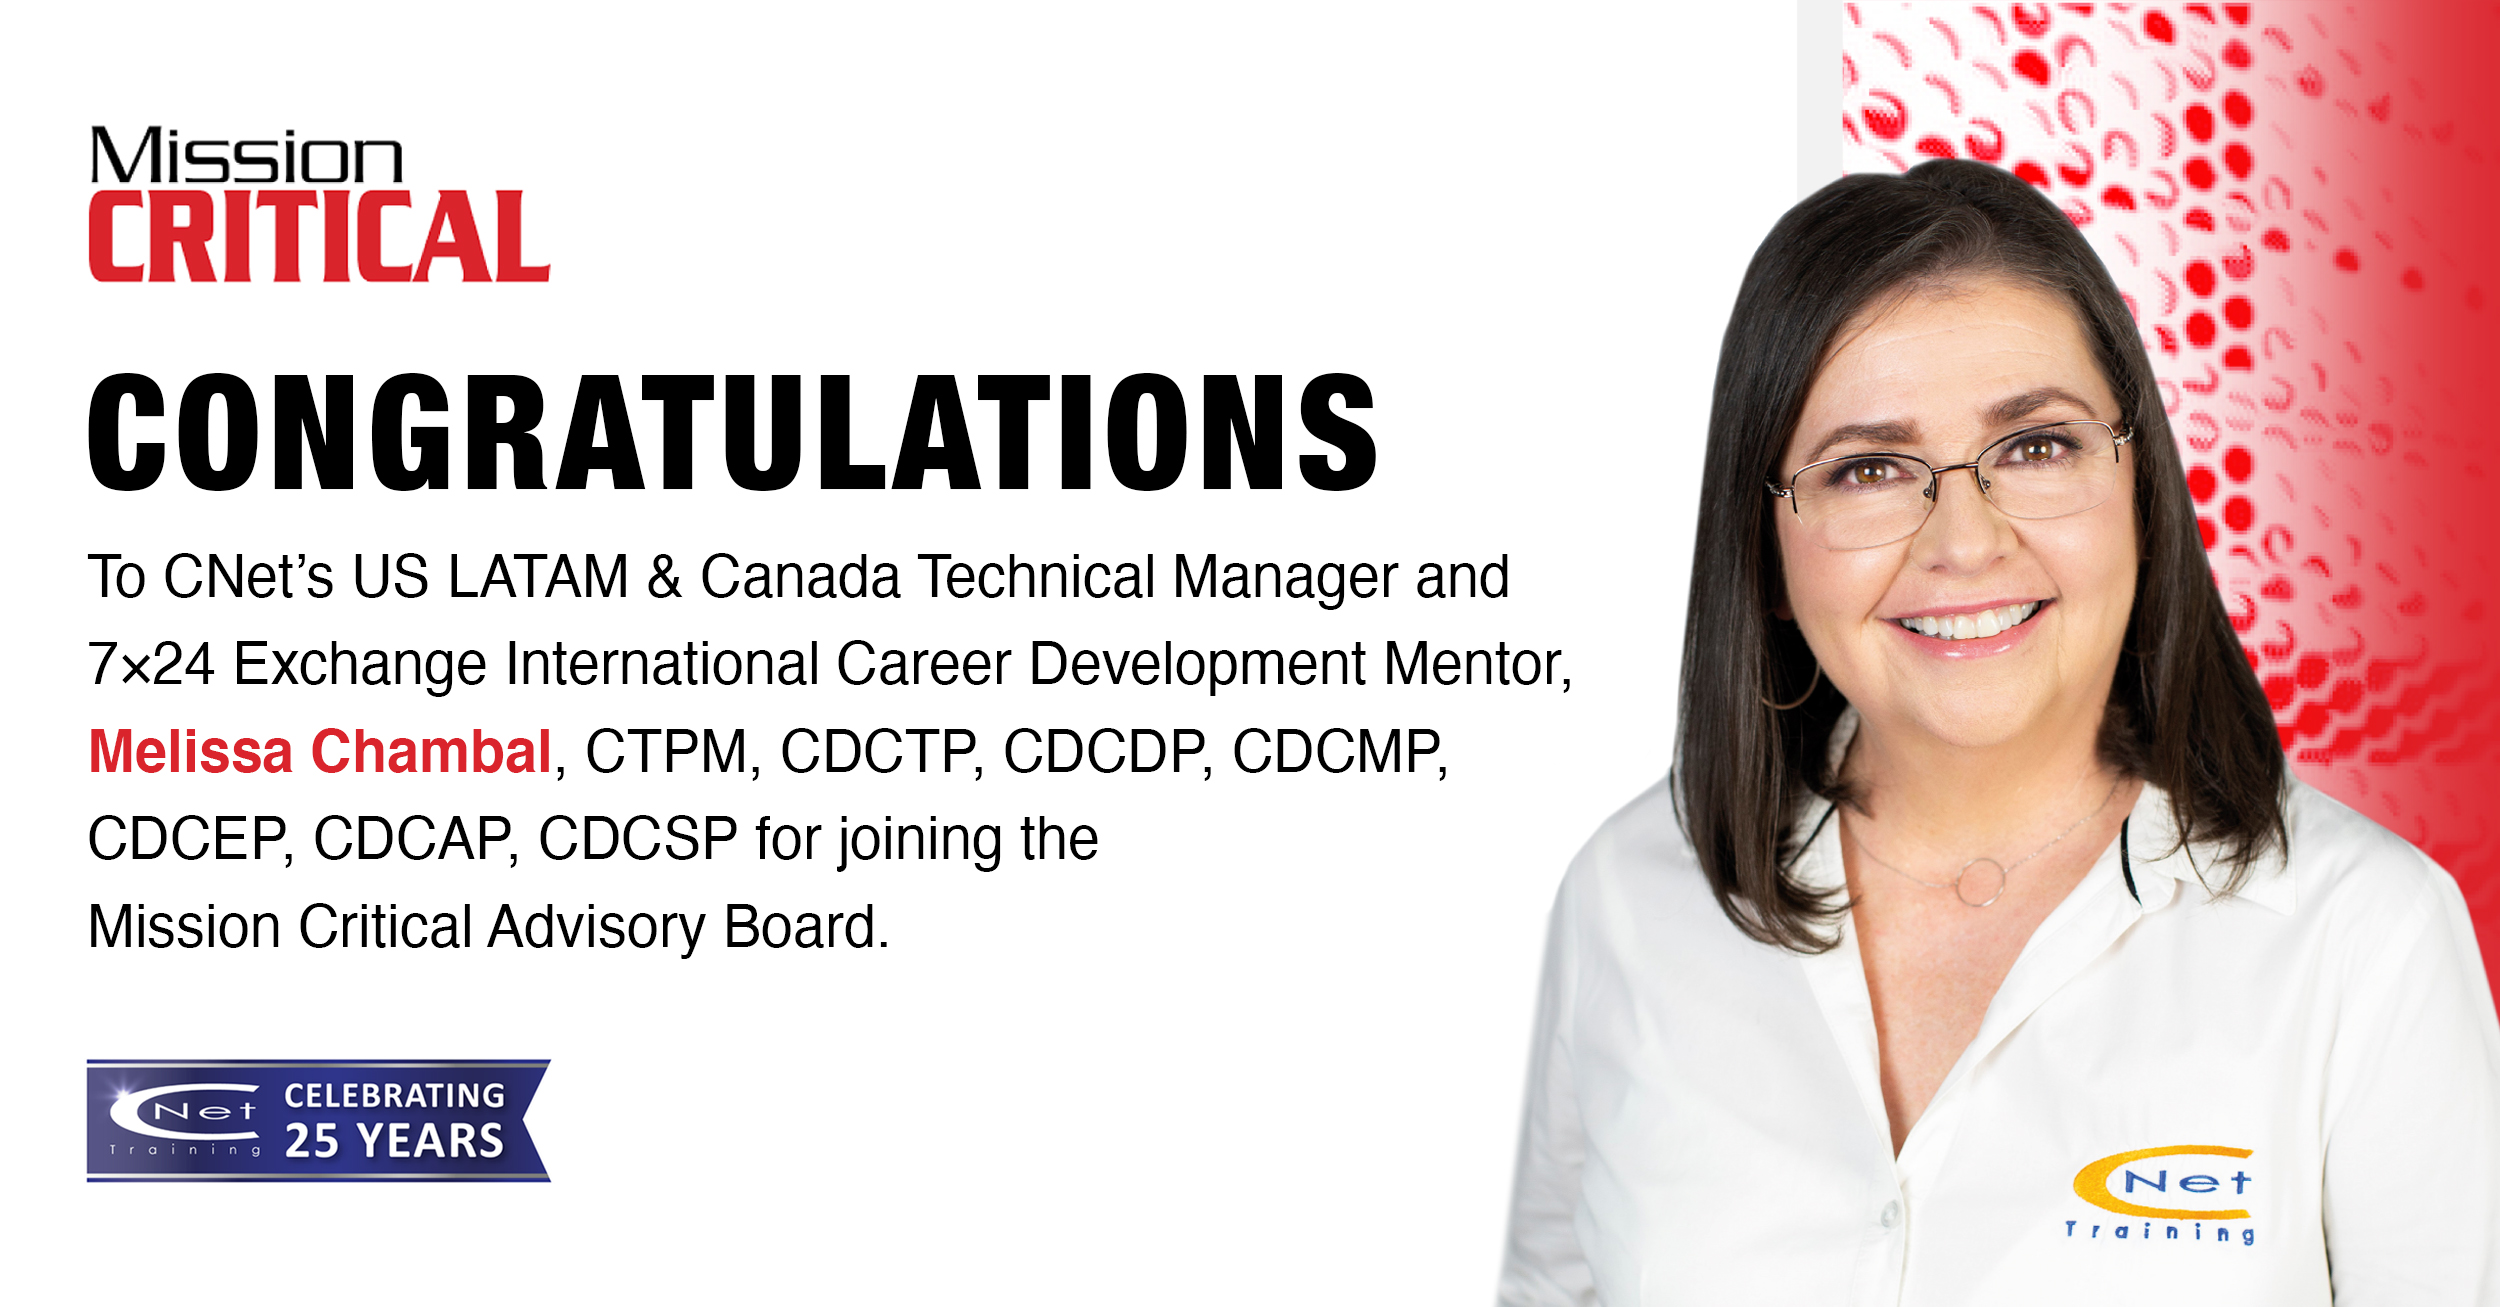 Melissa Chambal - Mission Criticla Advisory Board Member